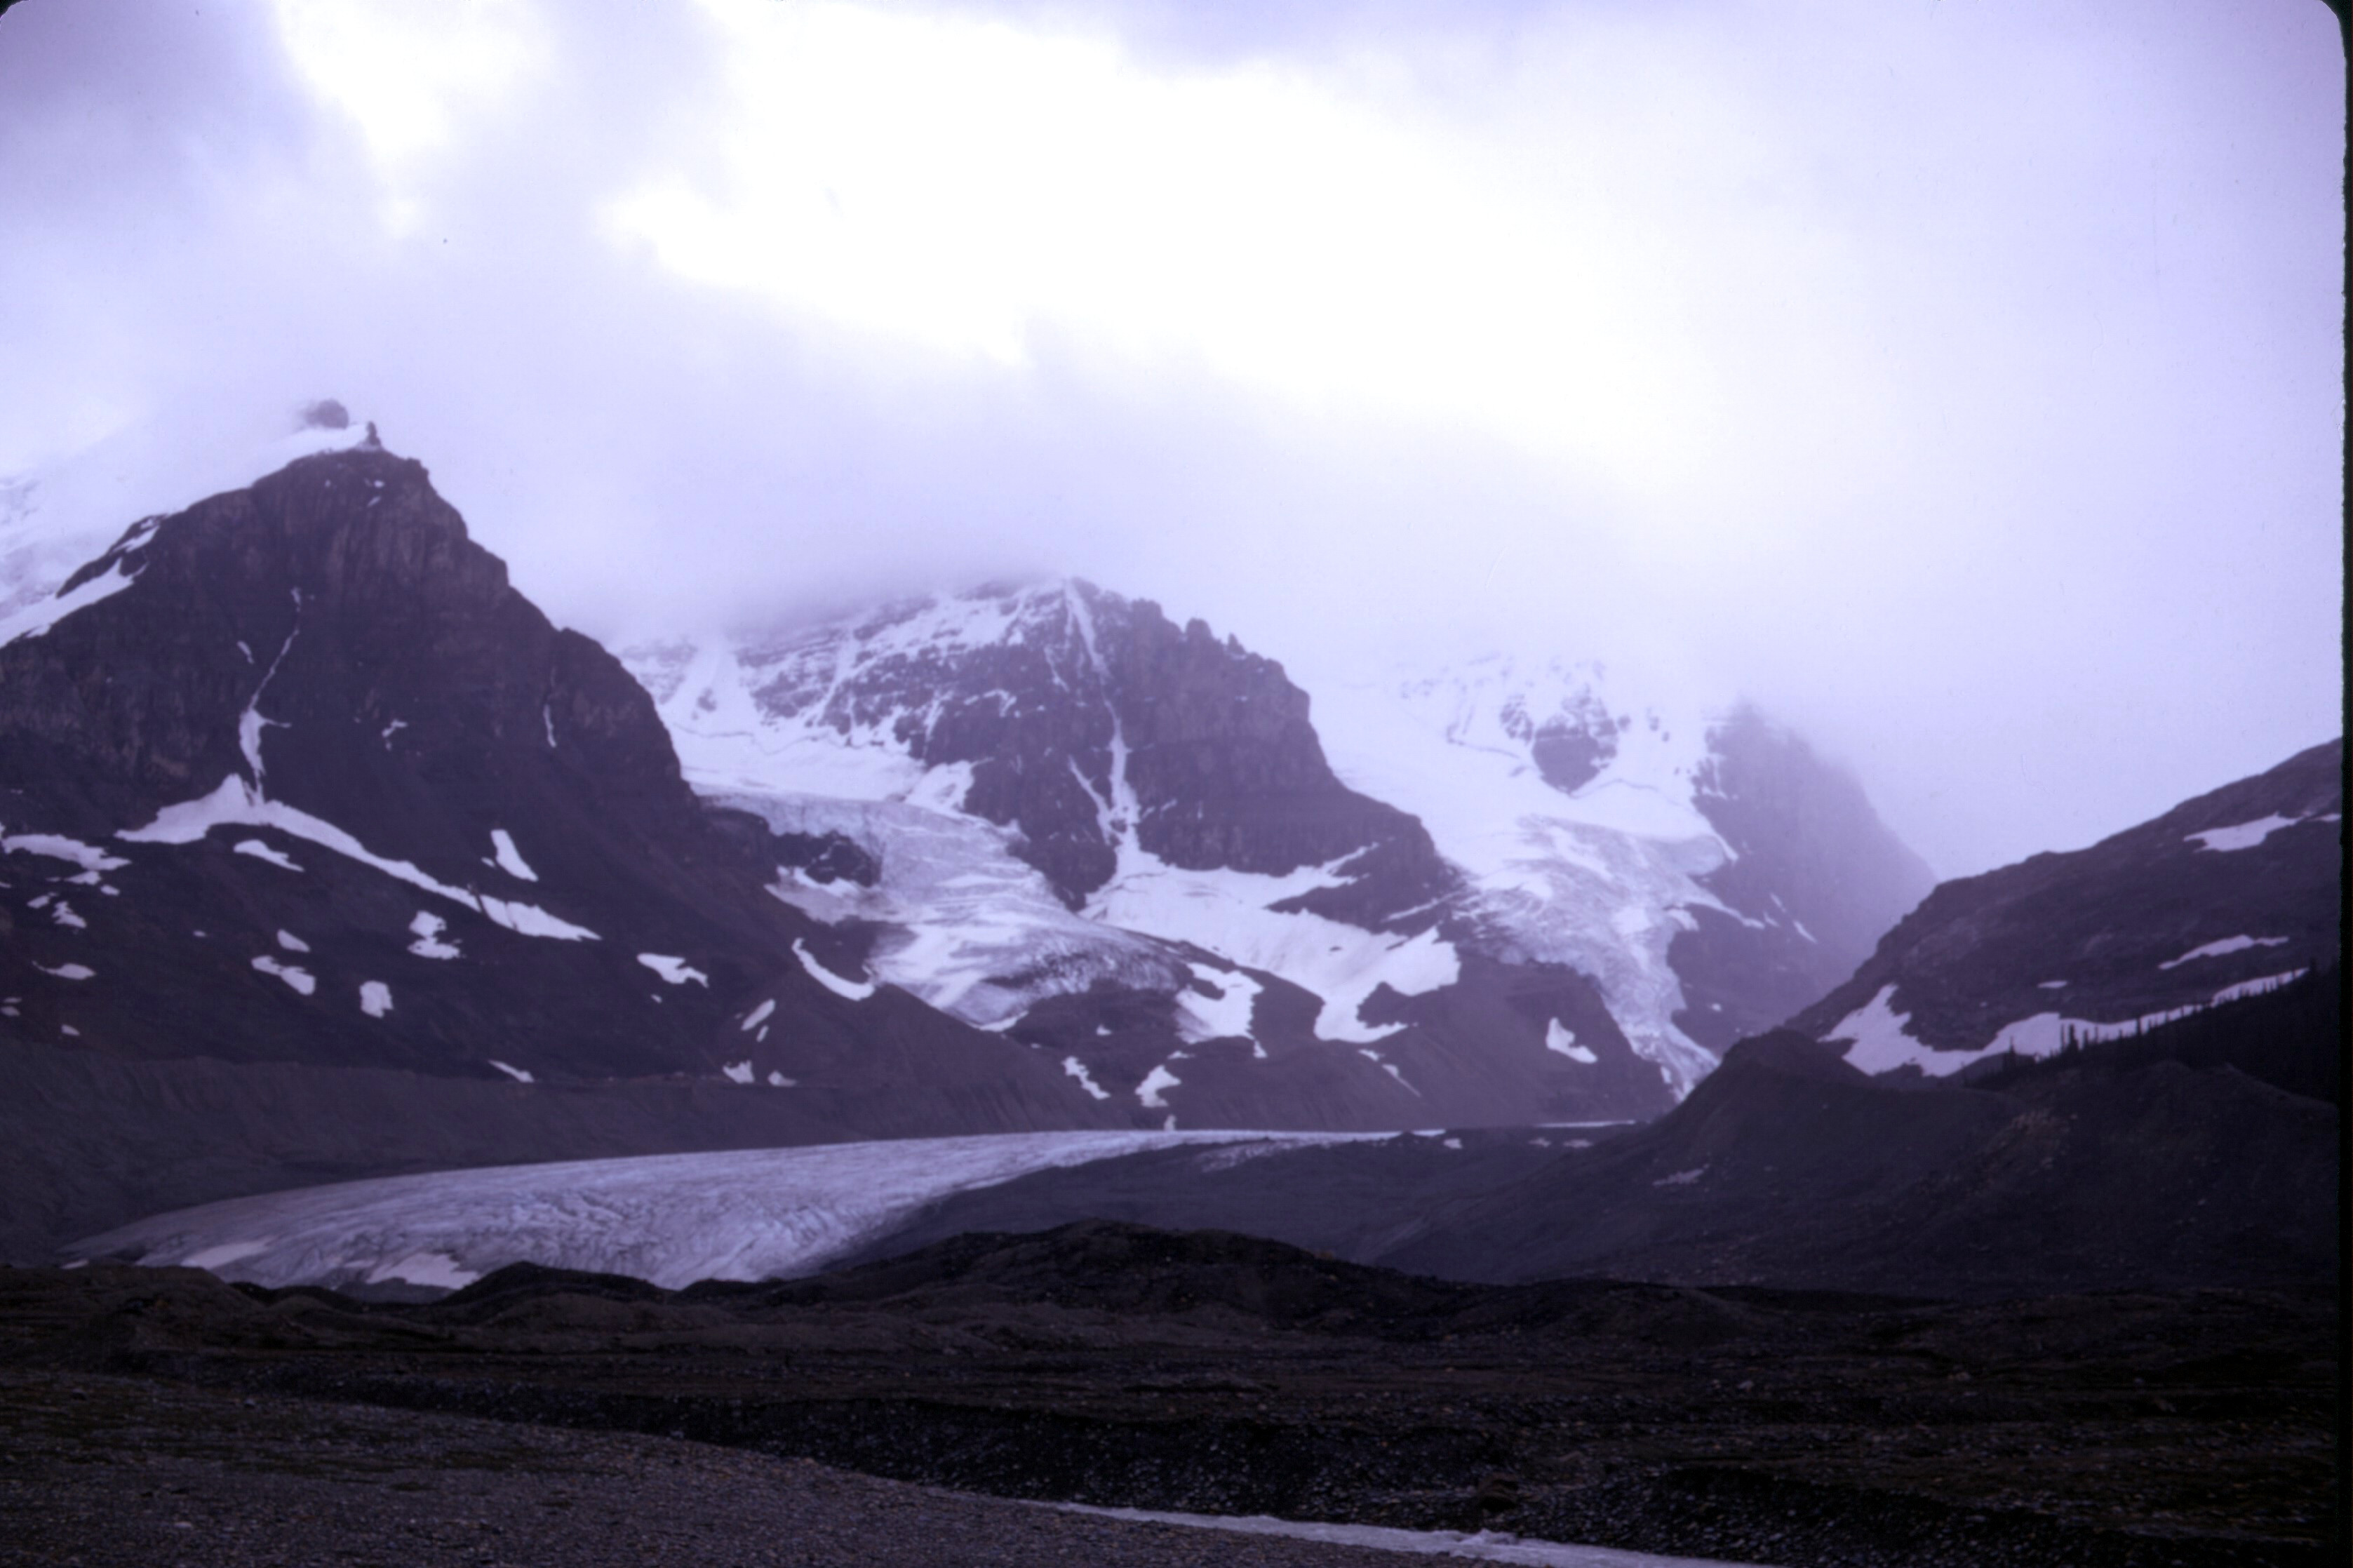 File:Columbia Ice Field, August 1974 03.jpg - Wikimedia